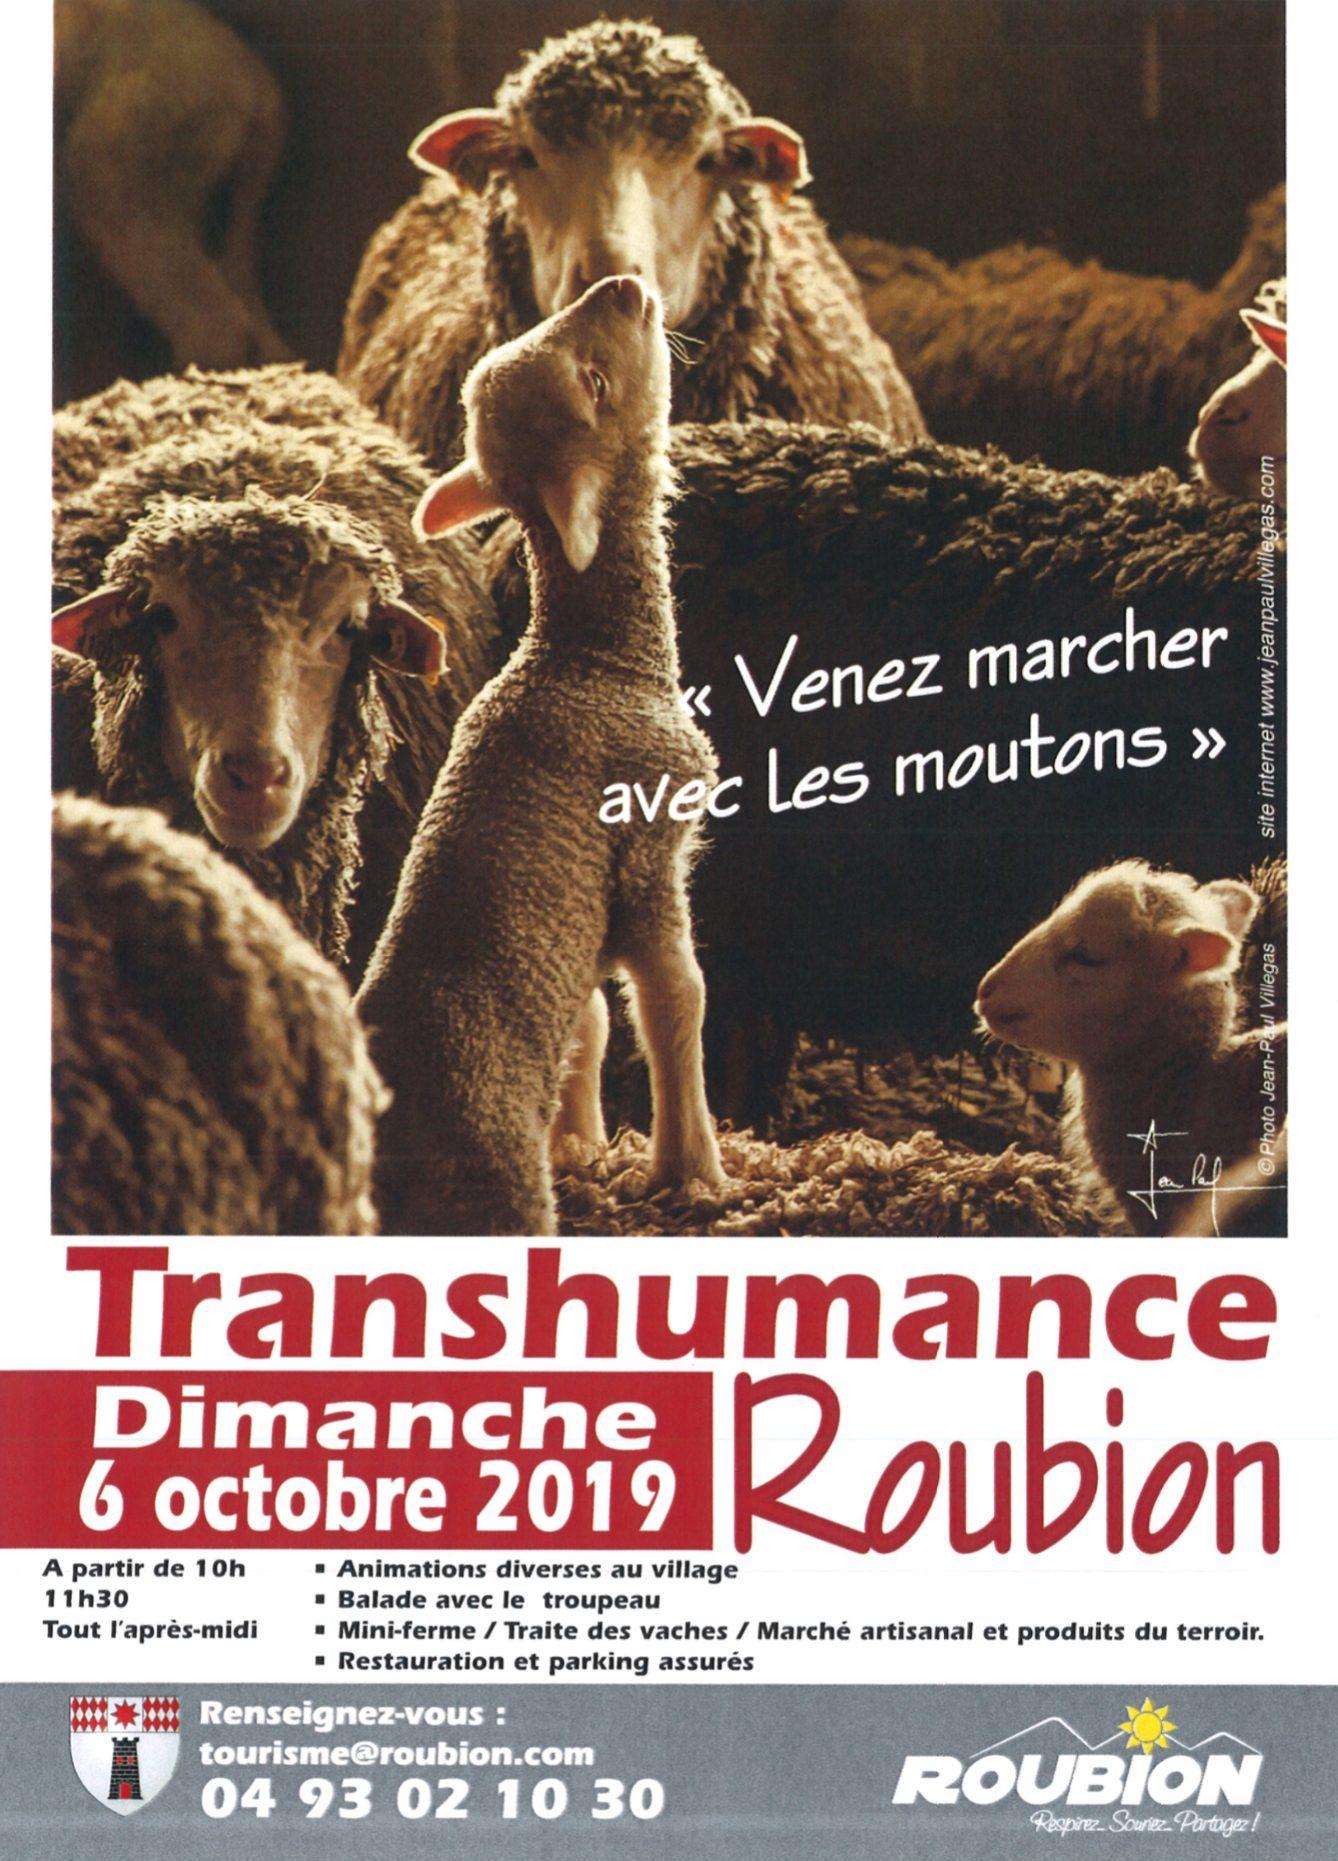 Transhumance Roubion